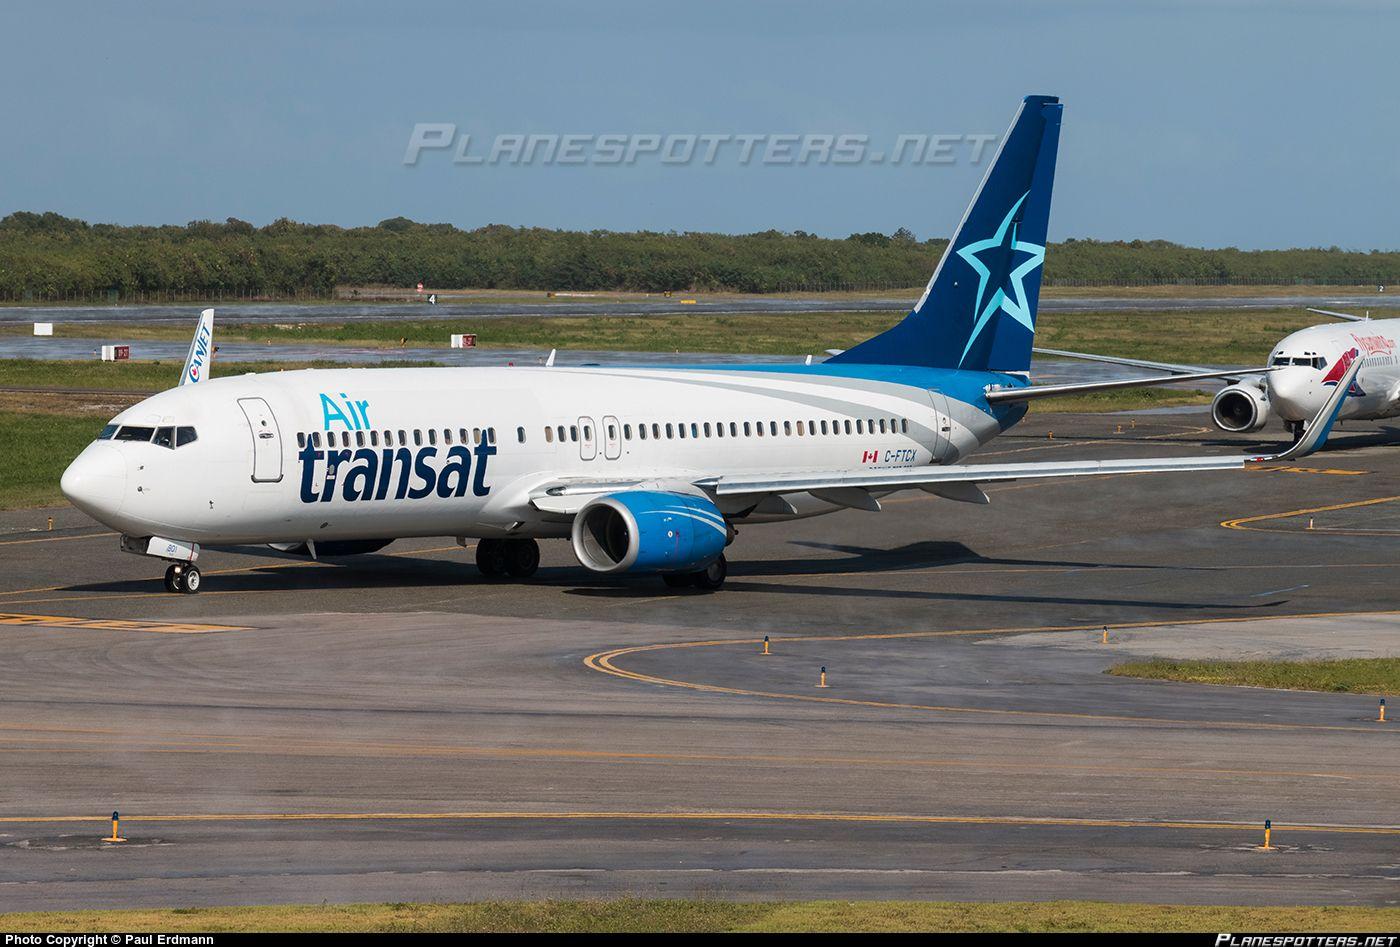 CFTCX Air Transat Boeing 7378AS(WL) Air transat